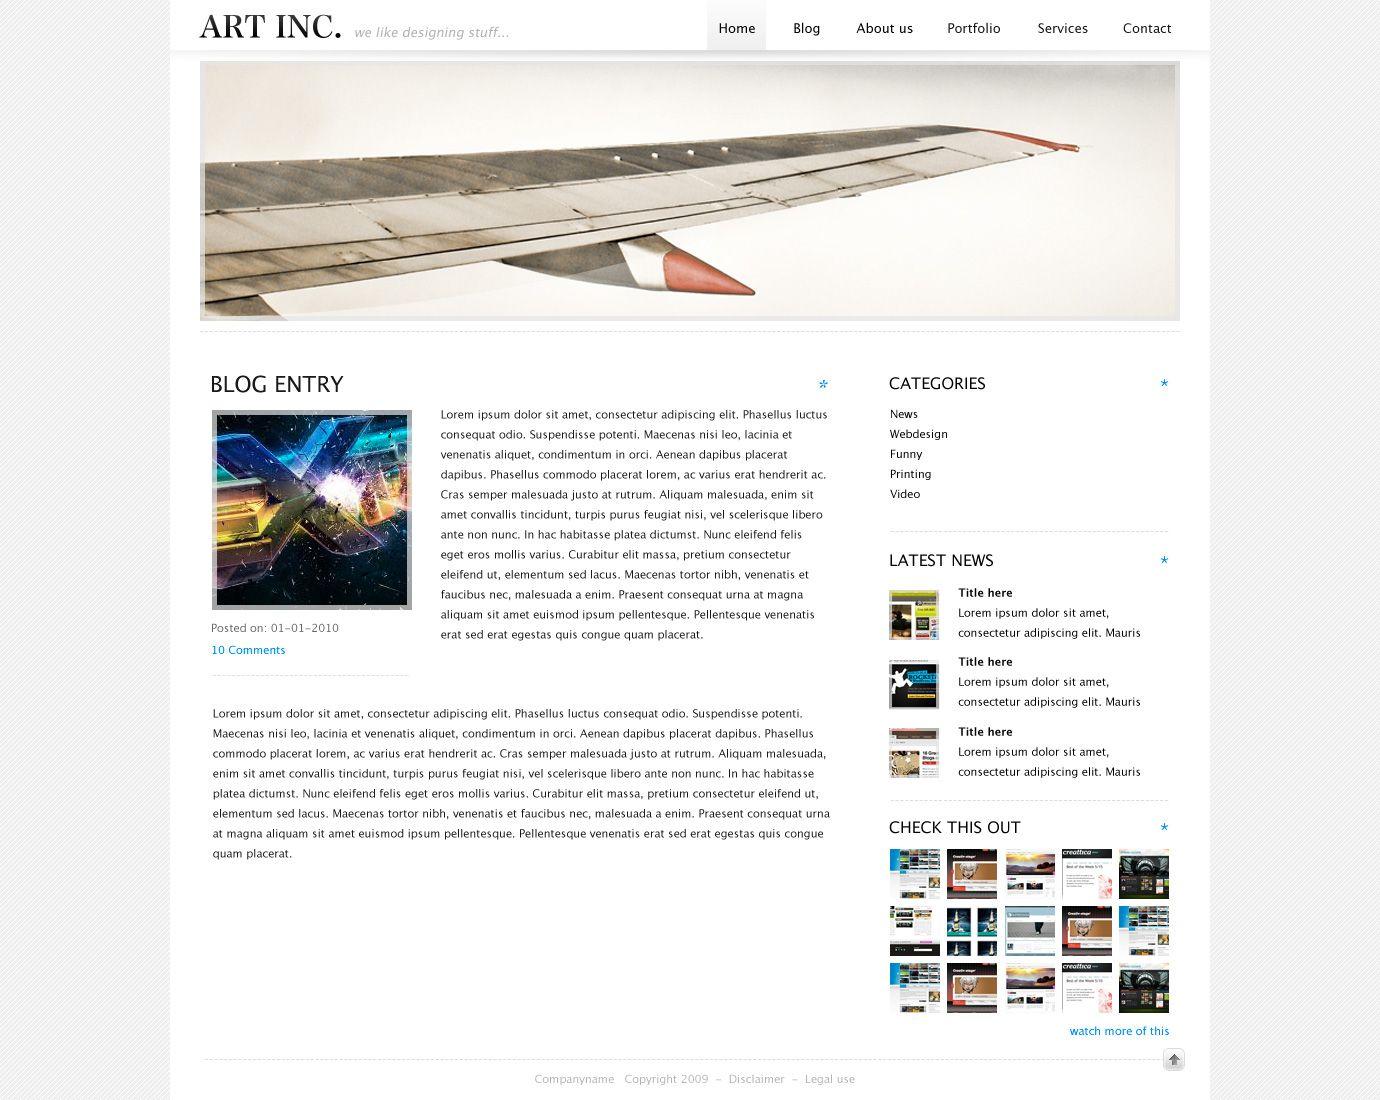 ART INC. ART Art, Creative websites, Blog entry